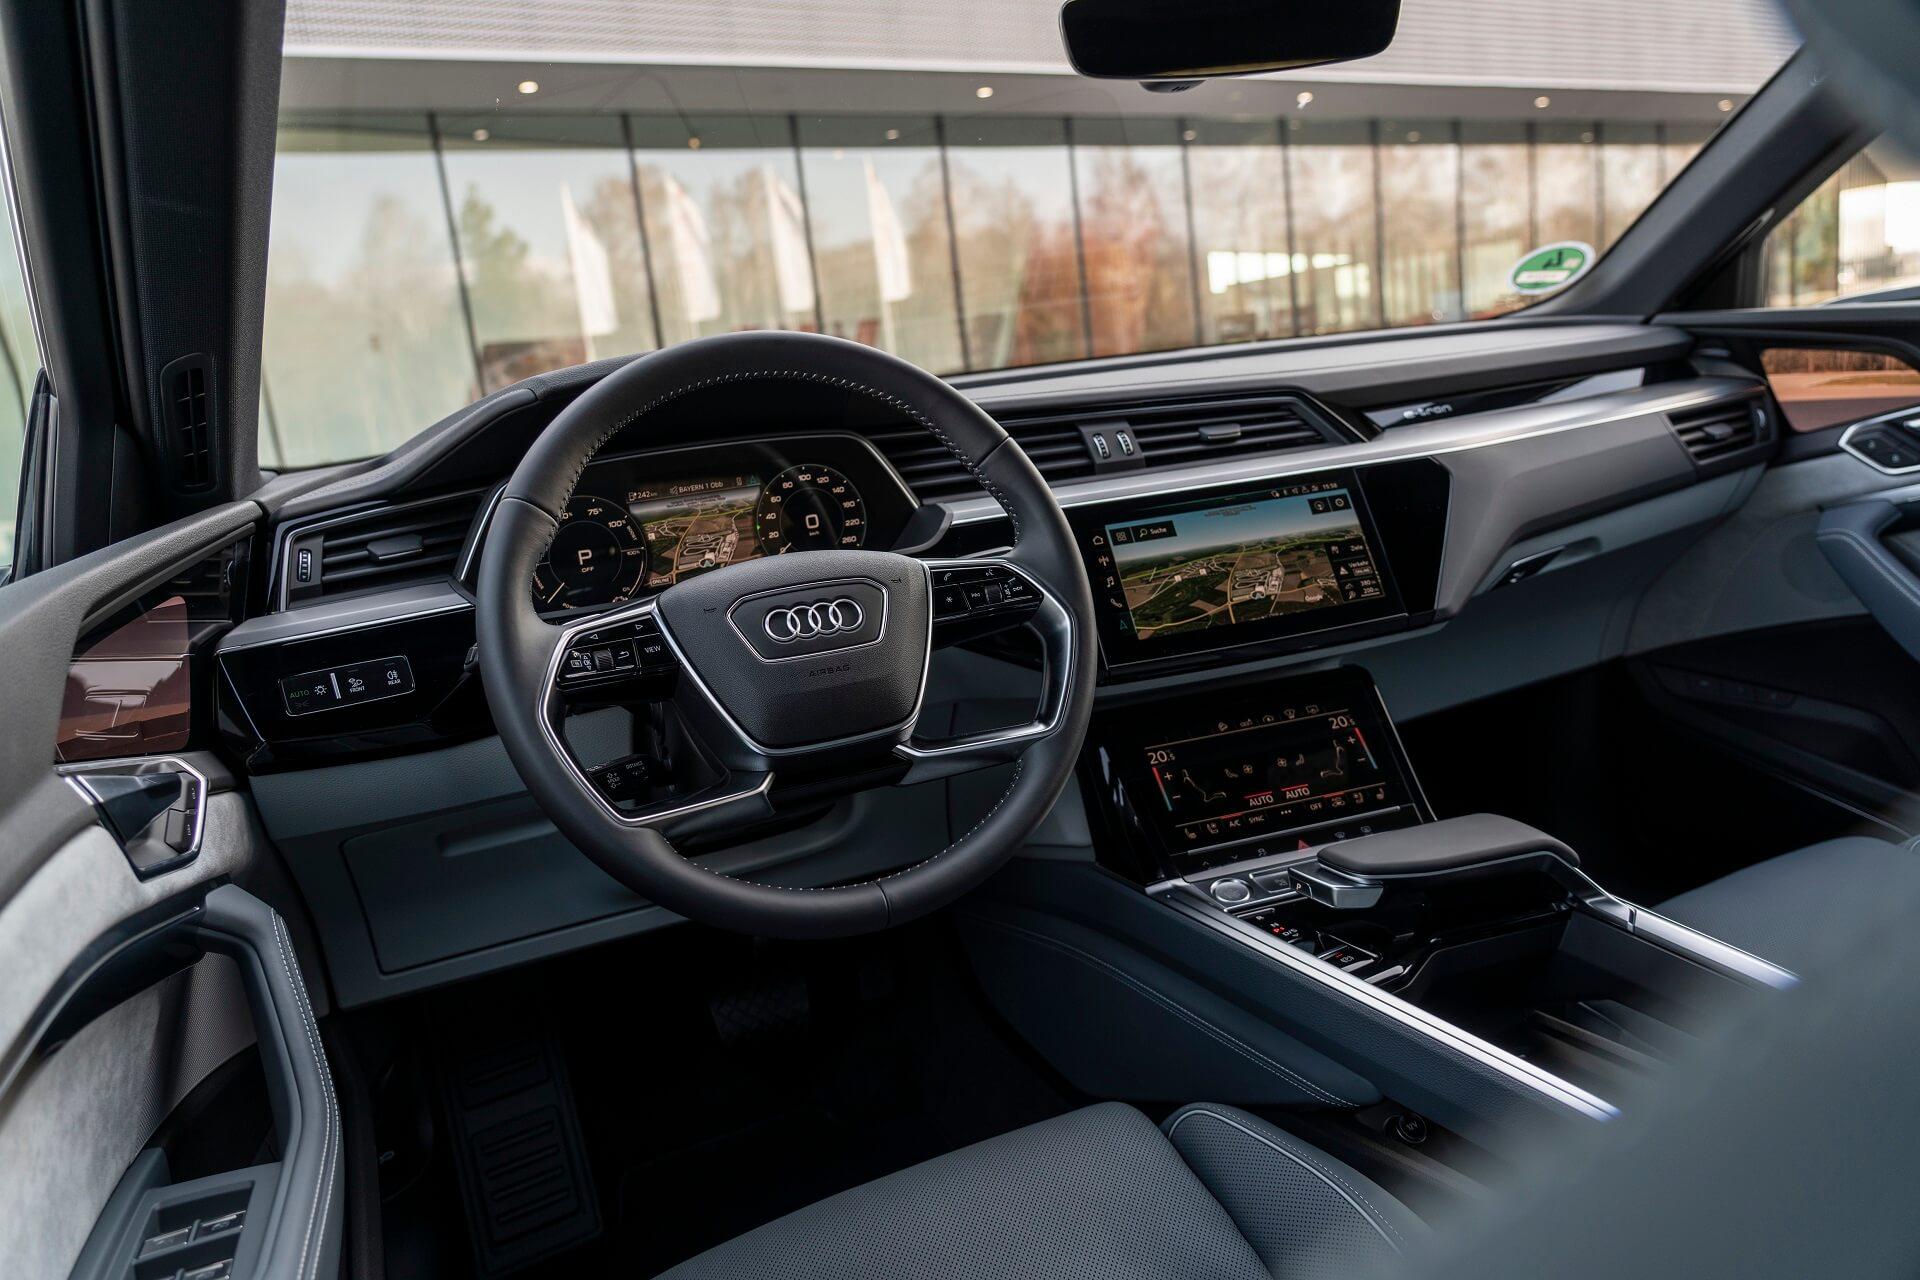 Audi e-tron Sportback - Εσωτερικό που συνδυάζει design και τεχνολογία